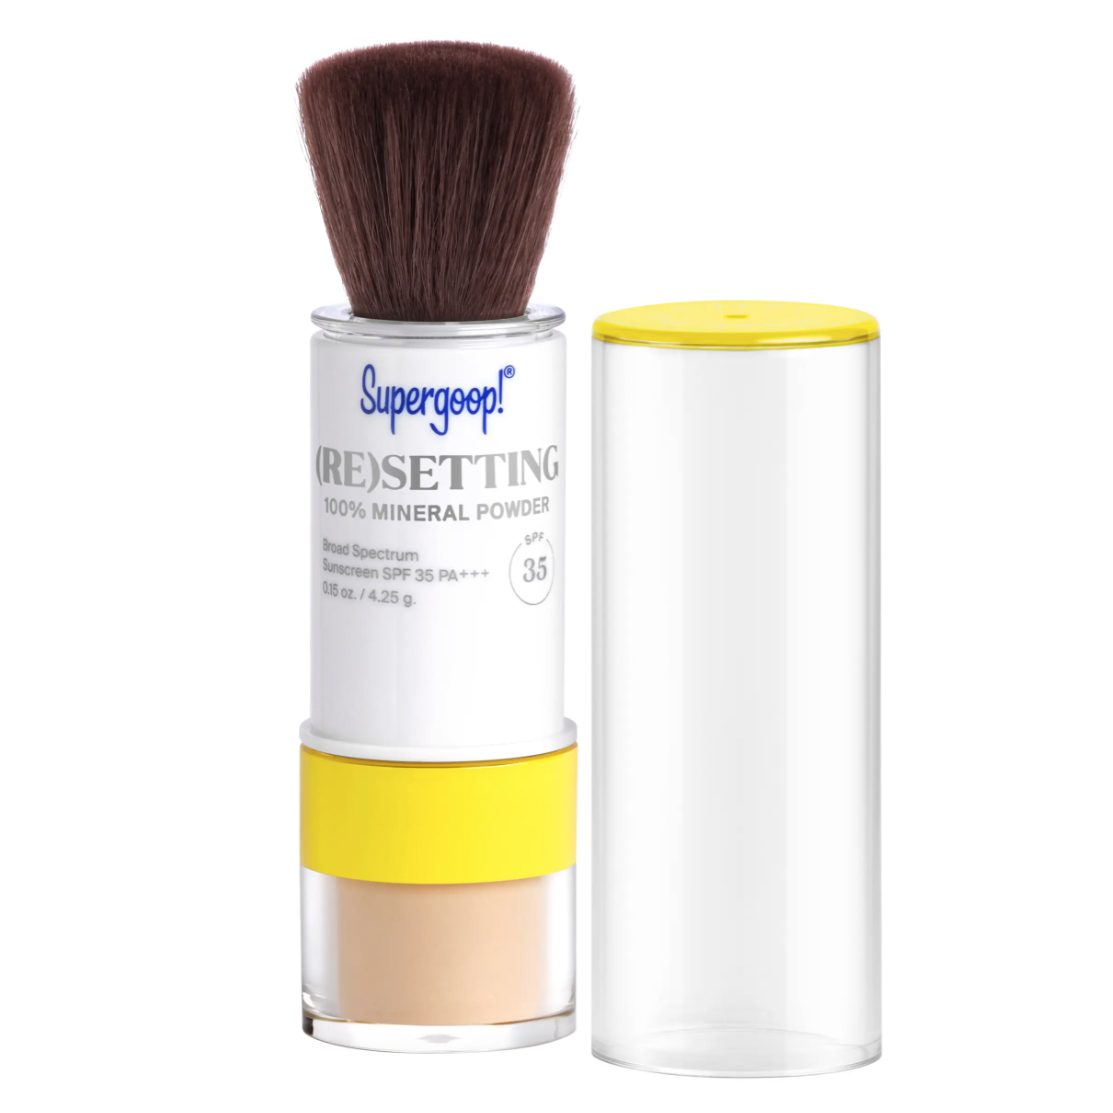 joanna vargas skincare routine sunscreen